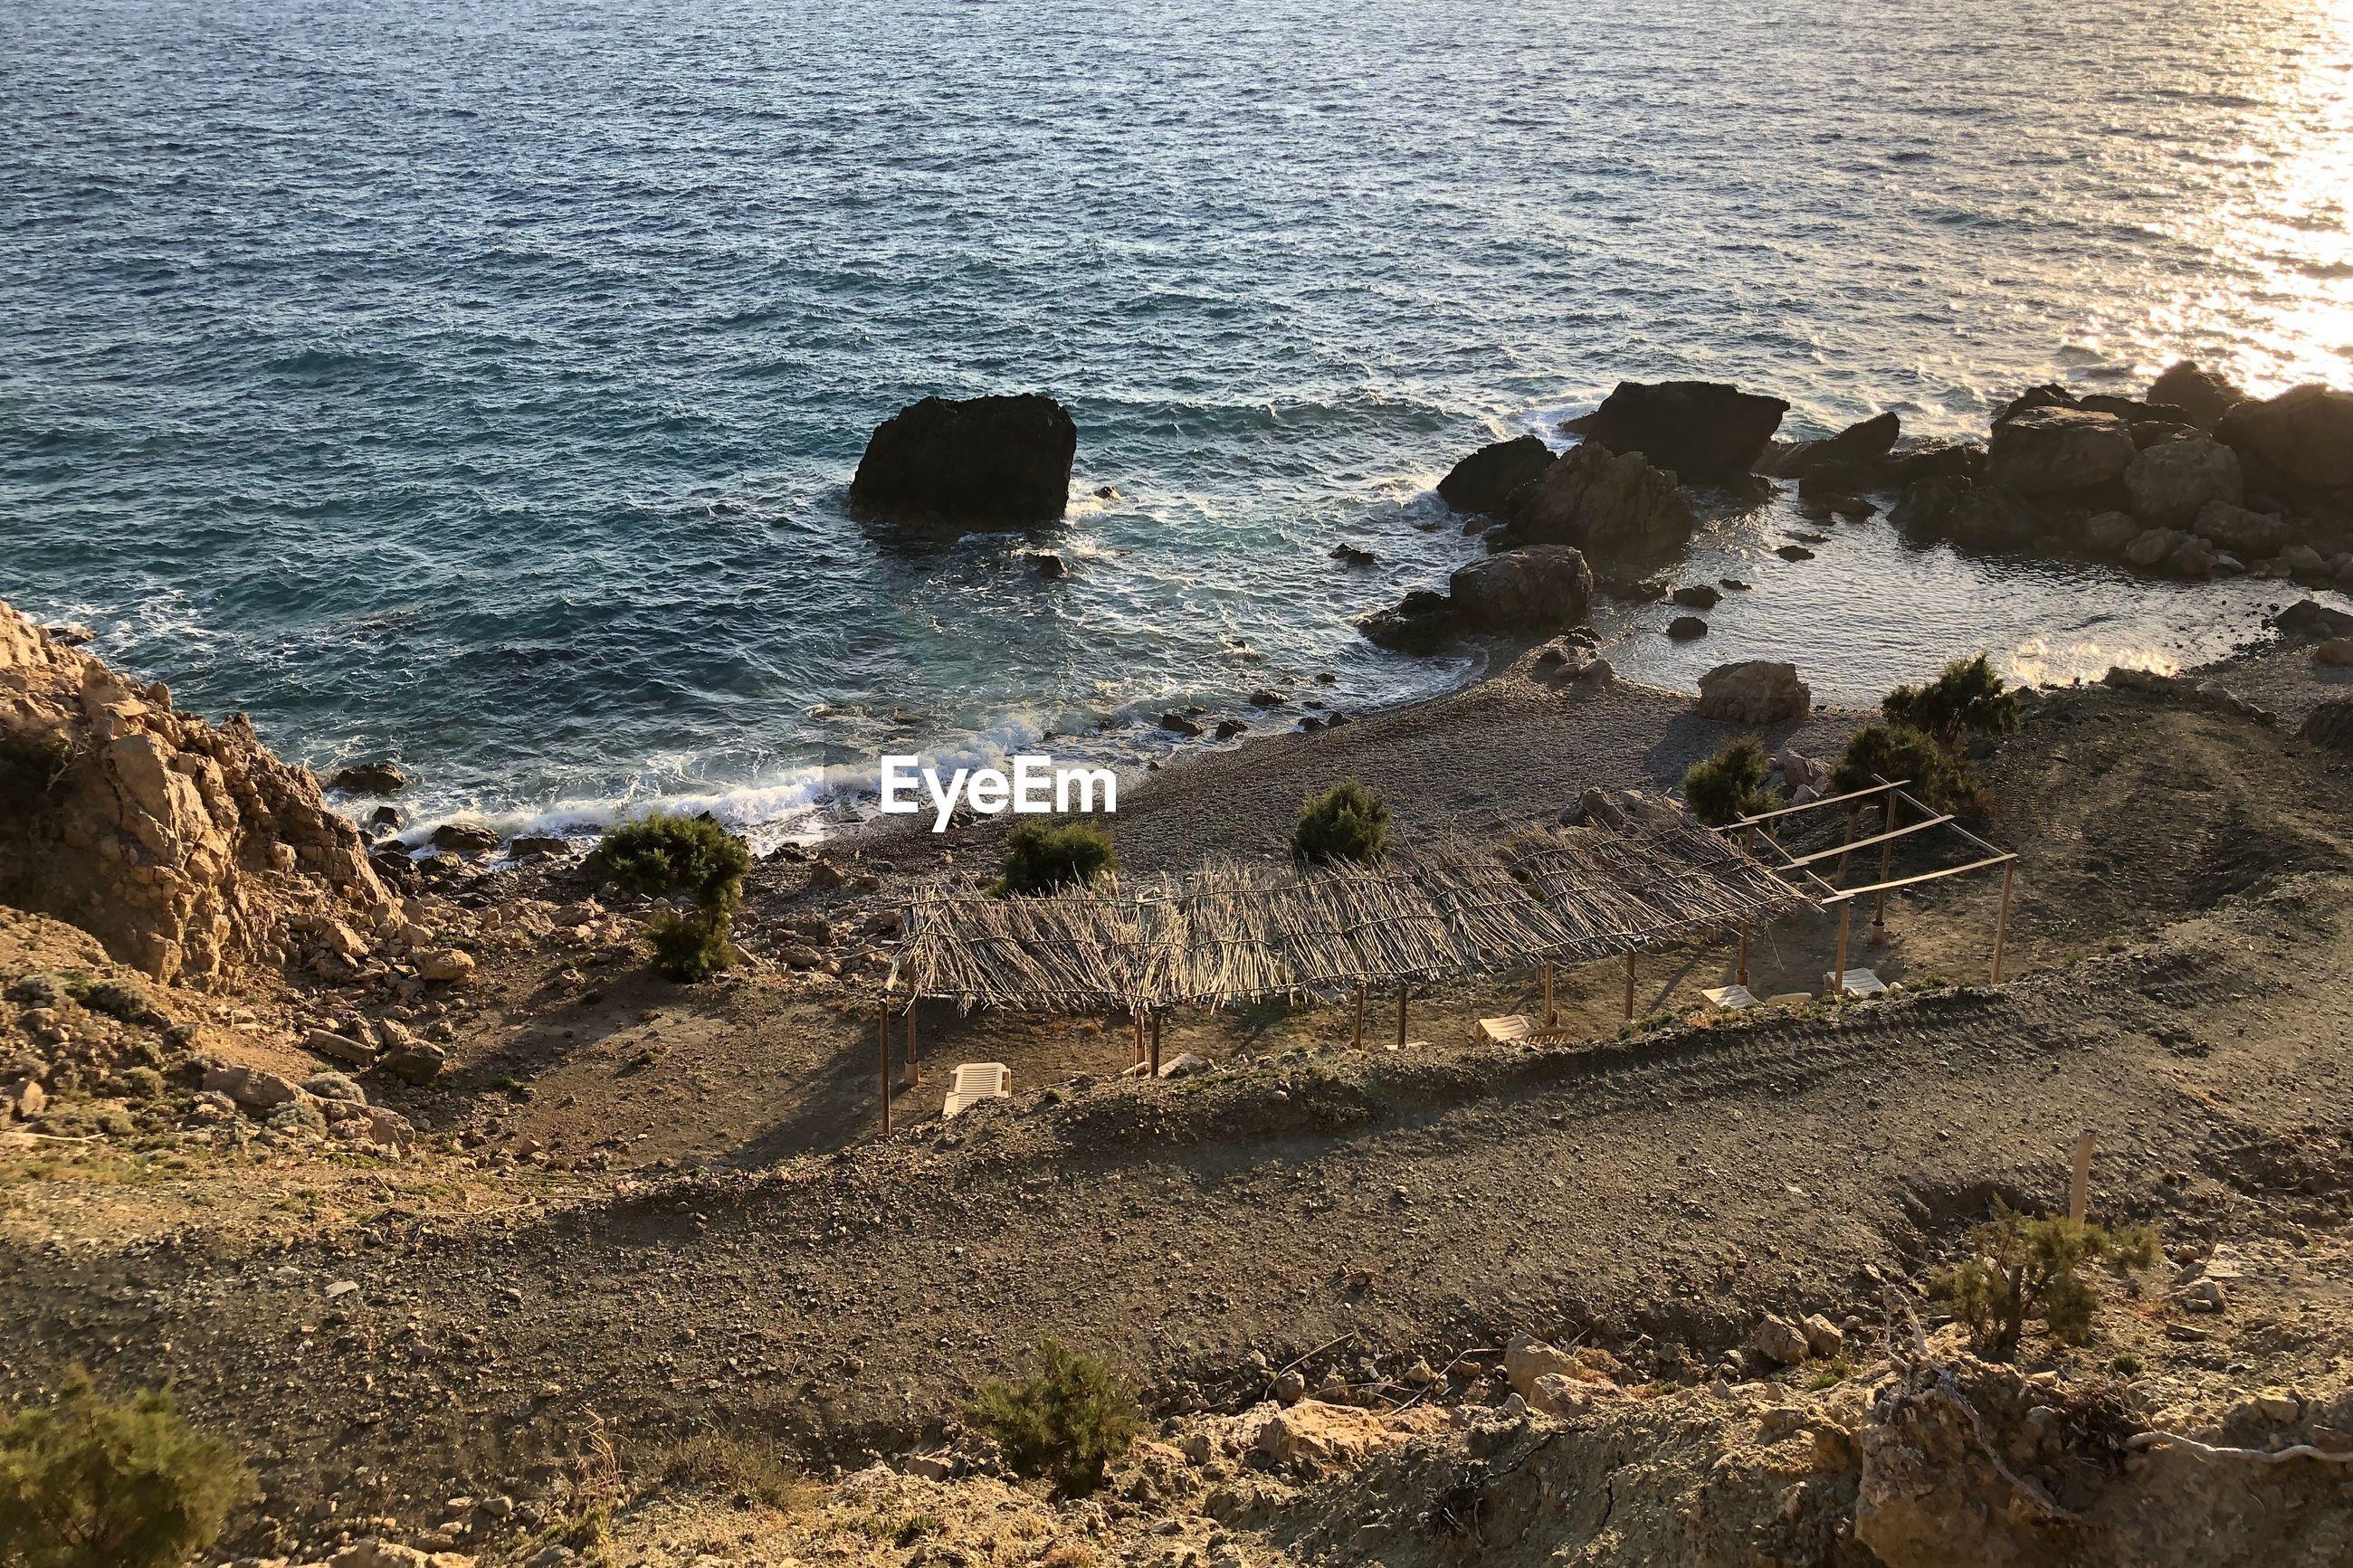 HIGH ANGLE VIEW OF ROCKS ON SHORE AT SEA